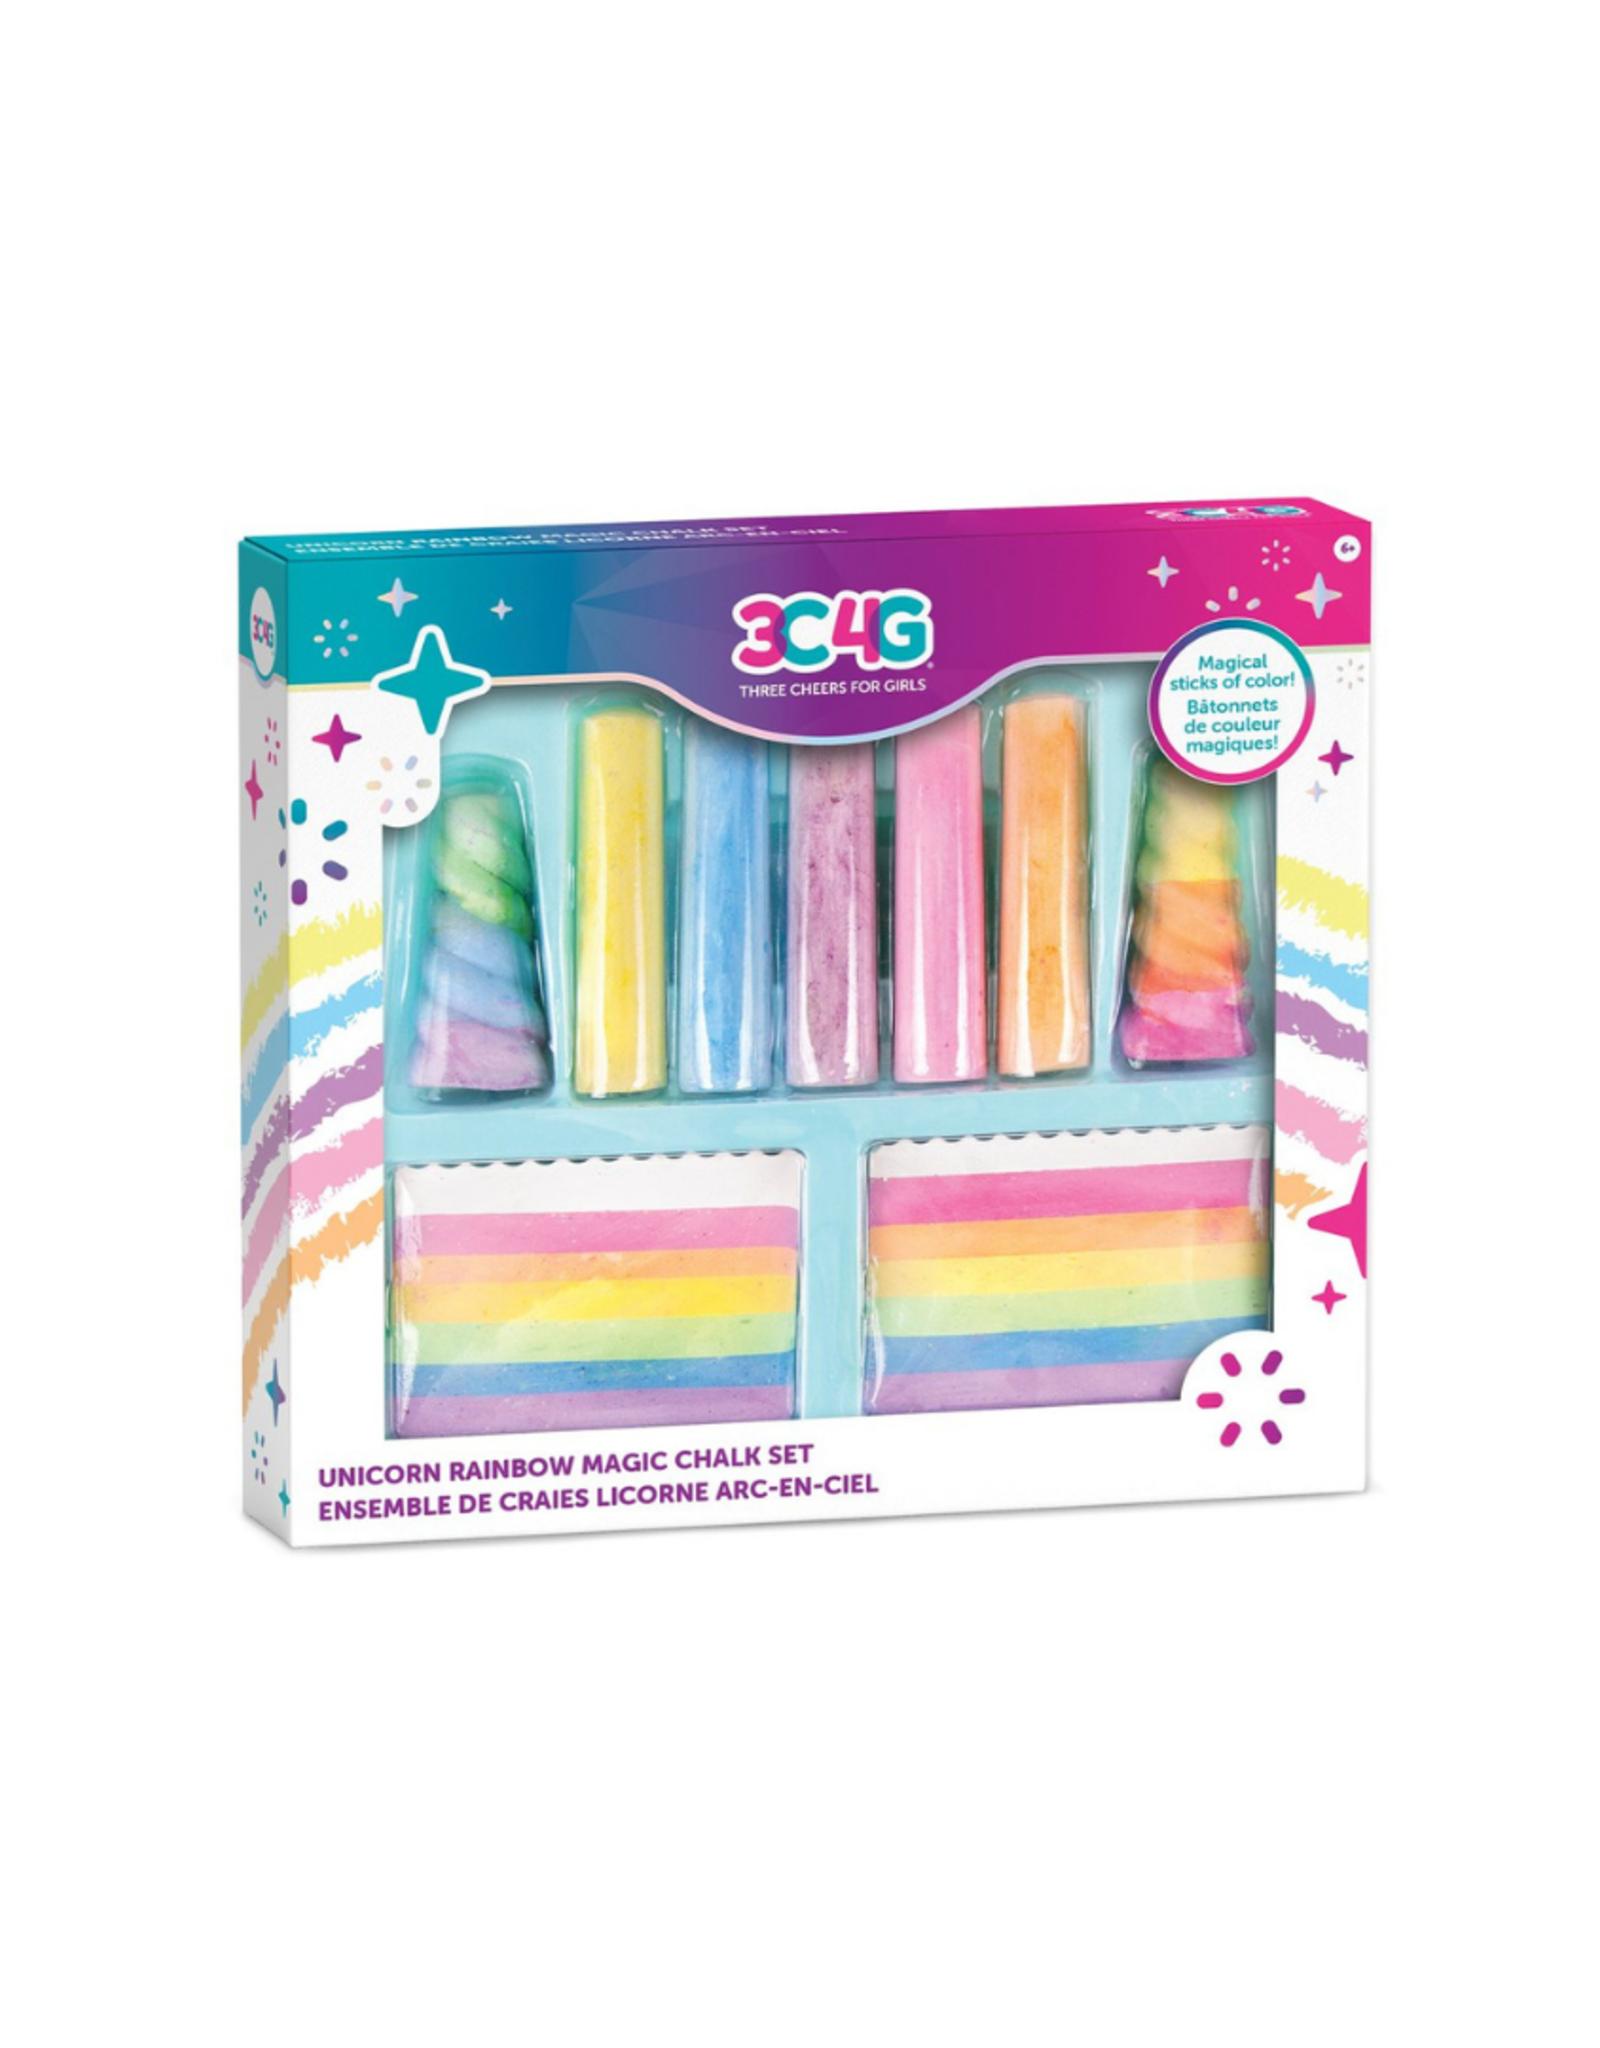 3C4G Rainbow Bright Chalk Set